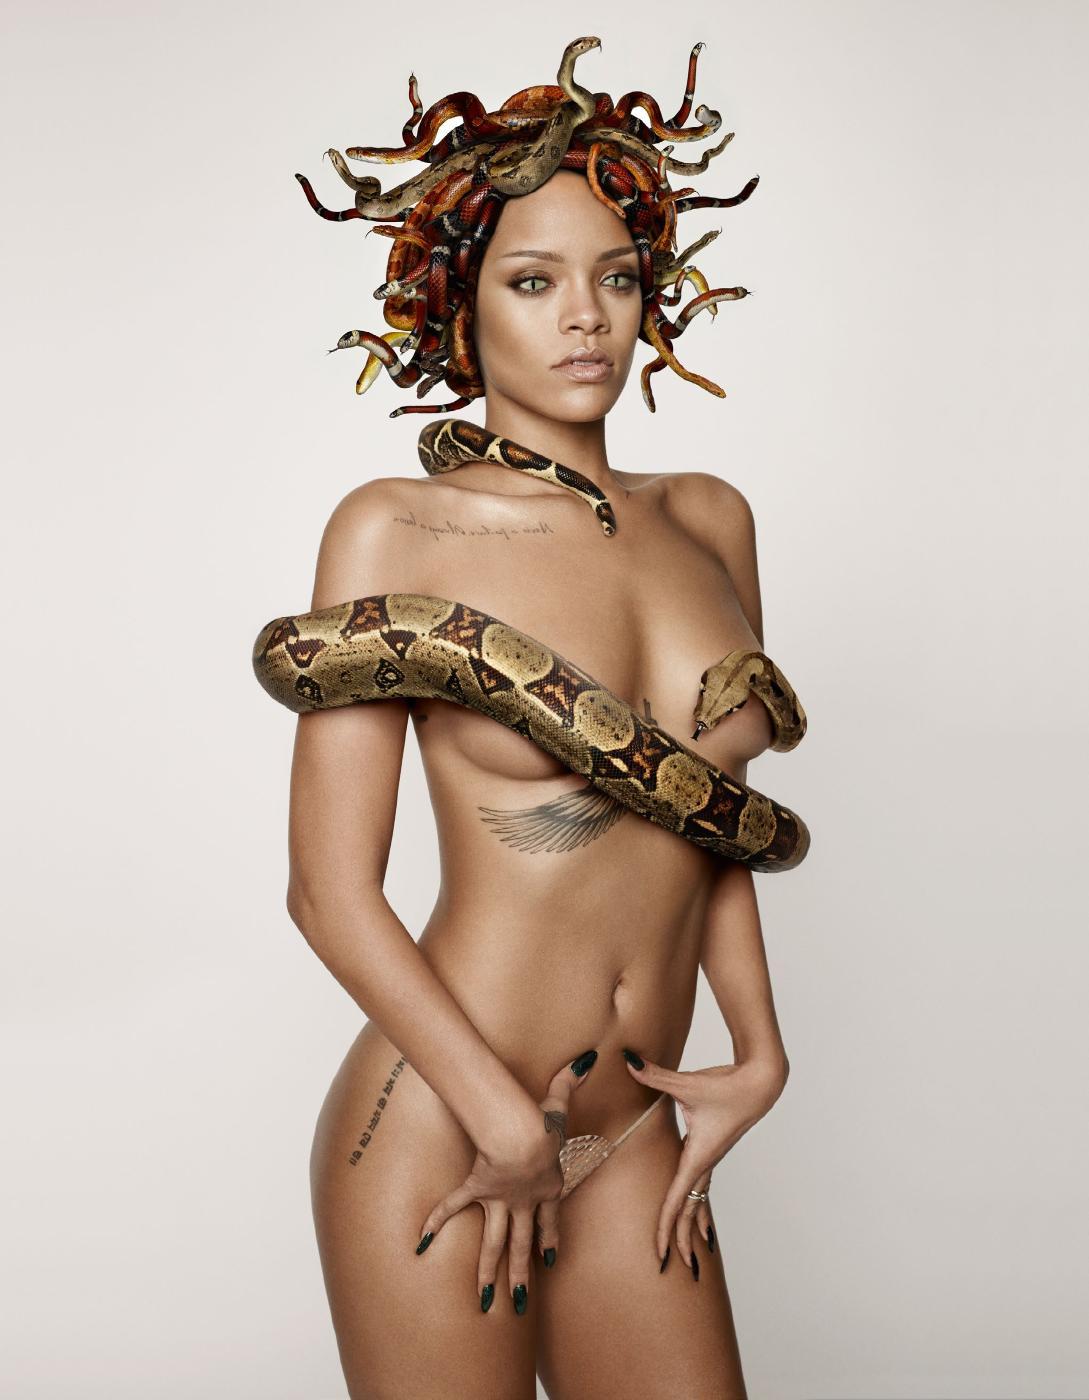 Rihanna Snake Photoshoot Nude Photos Leaked